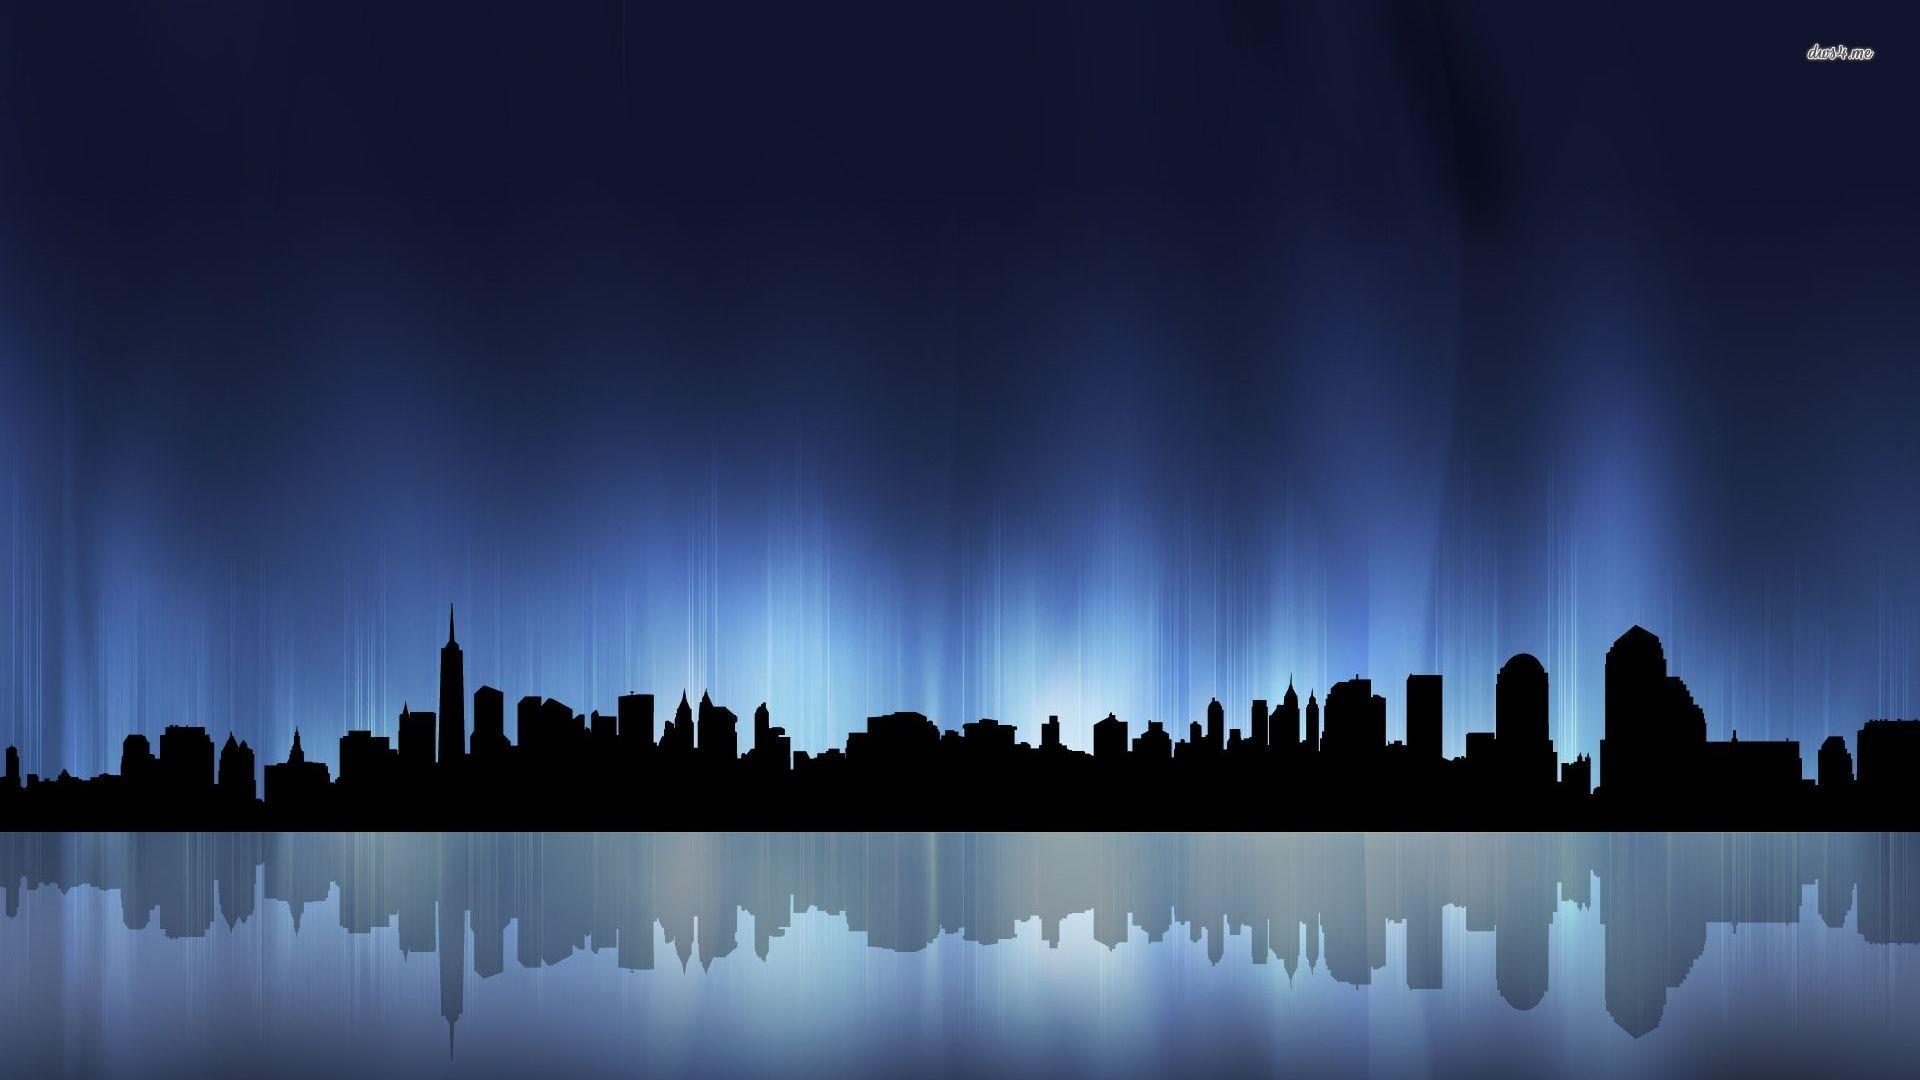 Click image for larger version. Name: 27552-new-york-skyline-